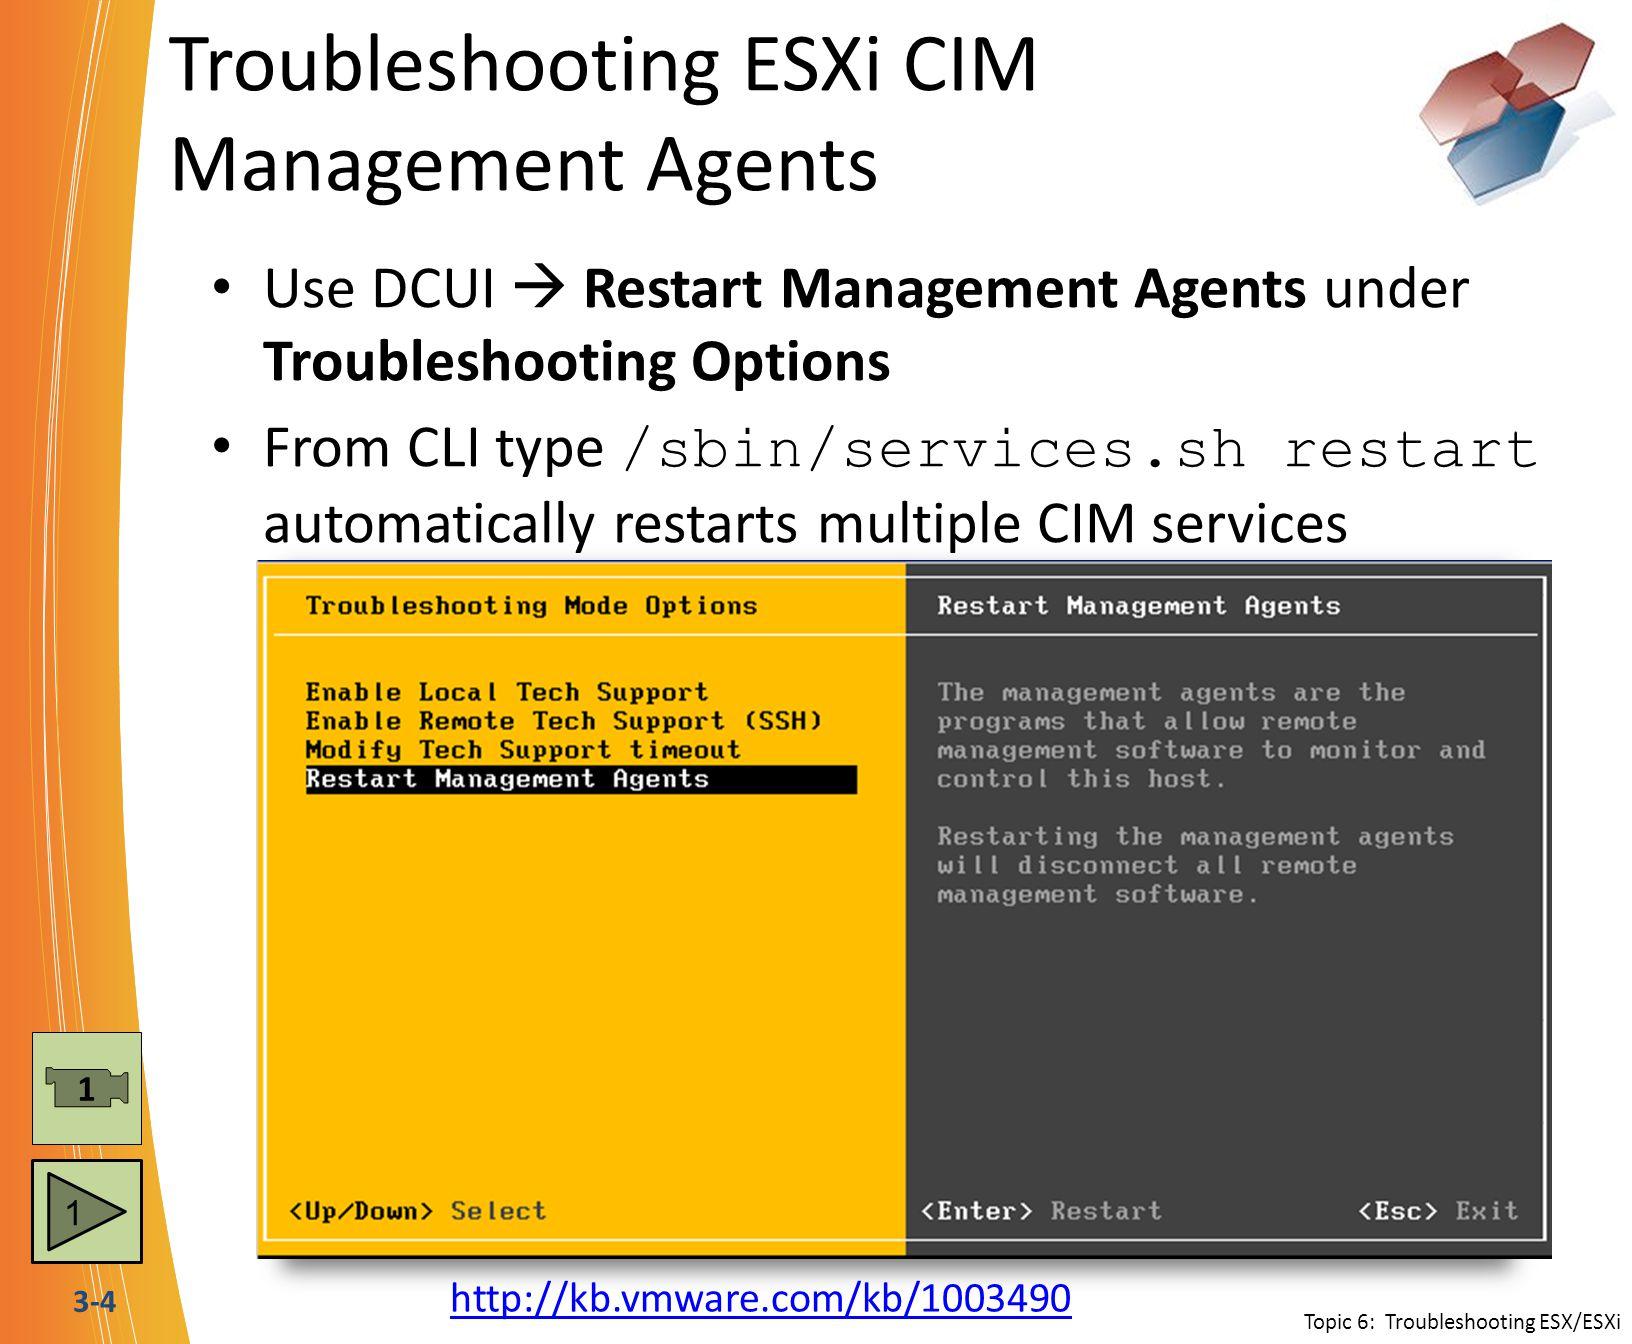 Troubleshooting ESXi CIM Management Agents